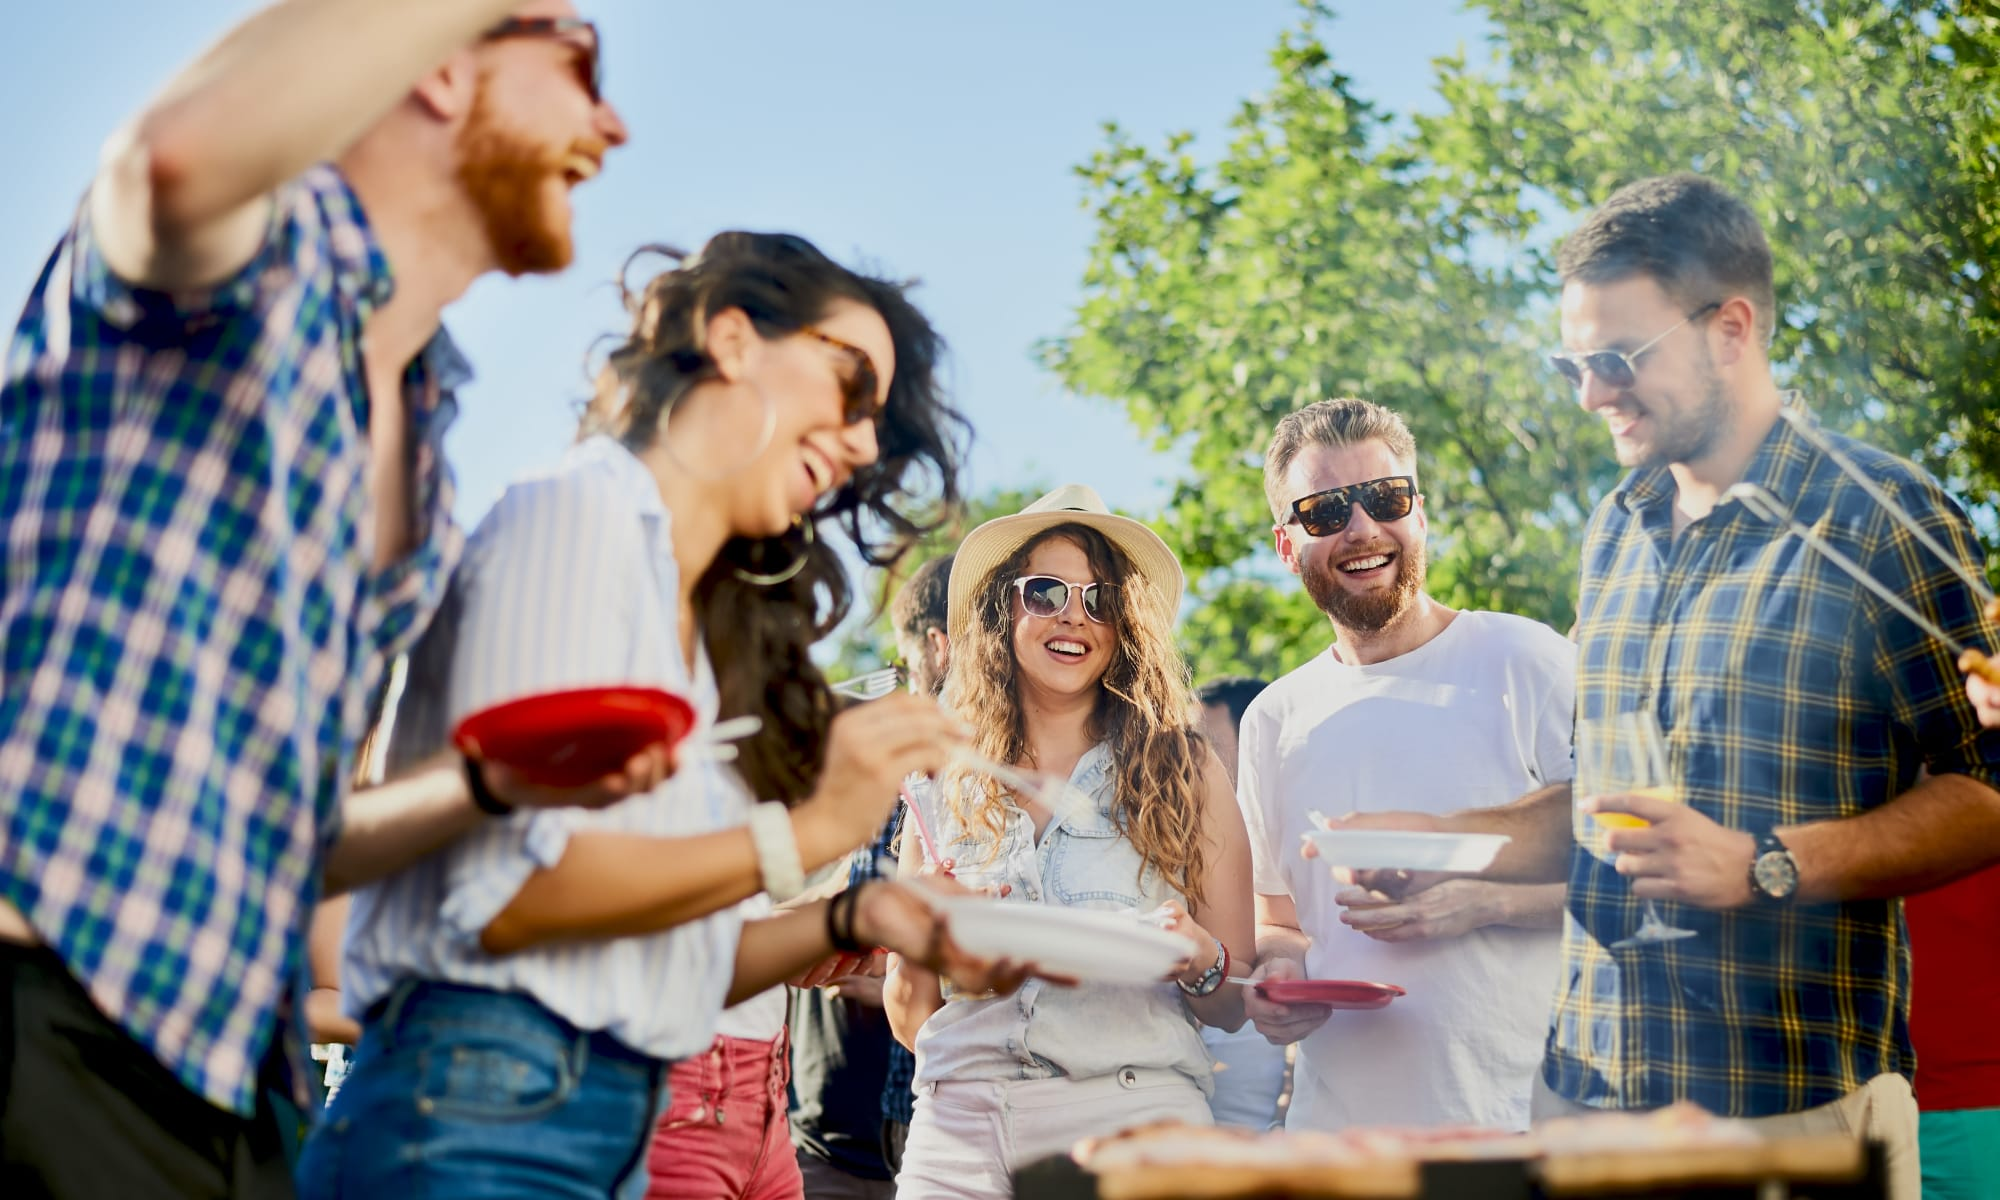 Barbecue with friends at Avilla Gateway in Phoenix, Arizona